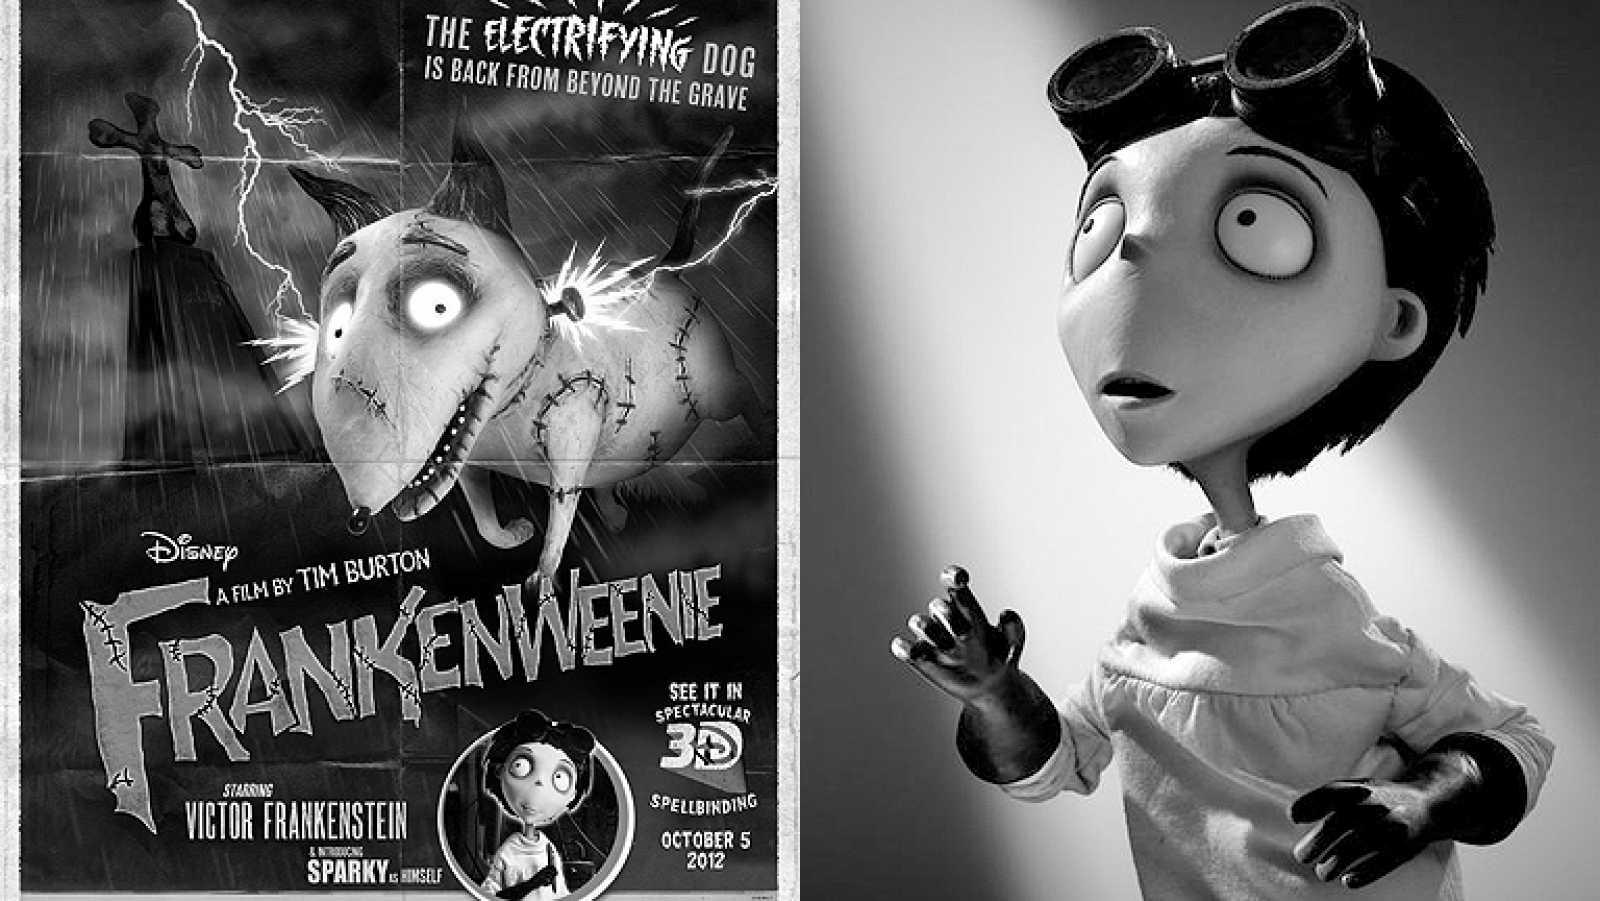 Llega Frankenweenie, un joven Victor Frankestein creado por Tim Burton